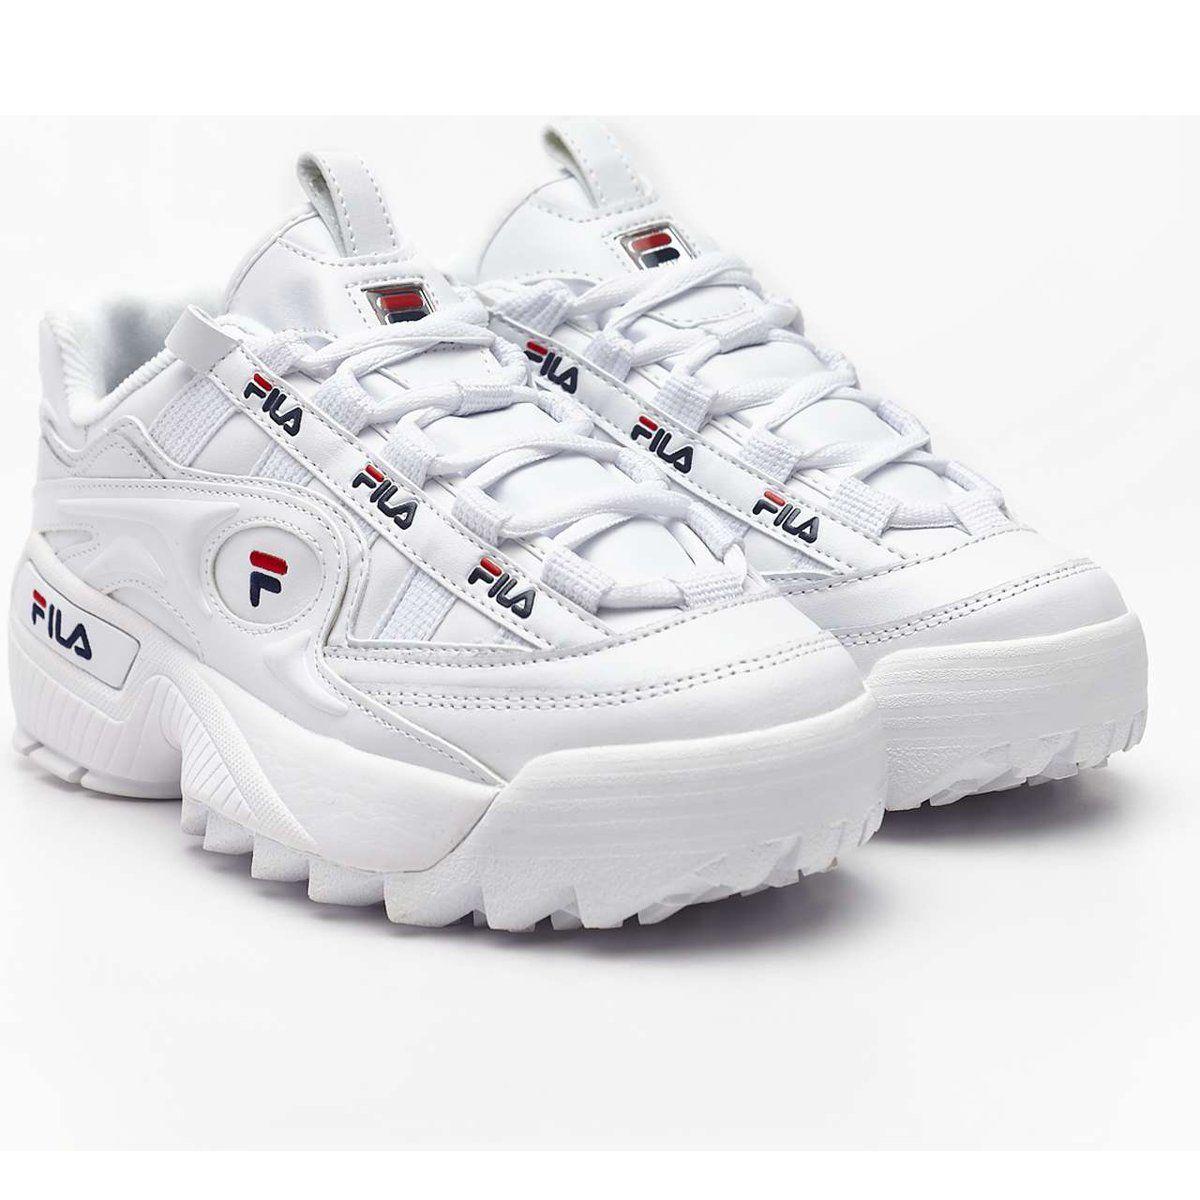 Sportowe Damskie Fila Biale D Formation Wmn 125 White Fila Navy Fila Red Sketchers Sneakers Shoes Navy